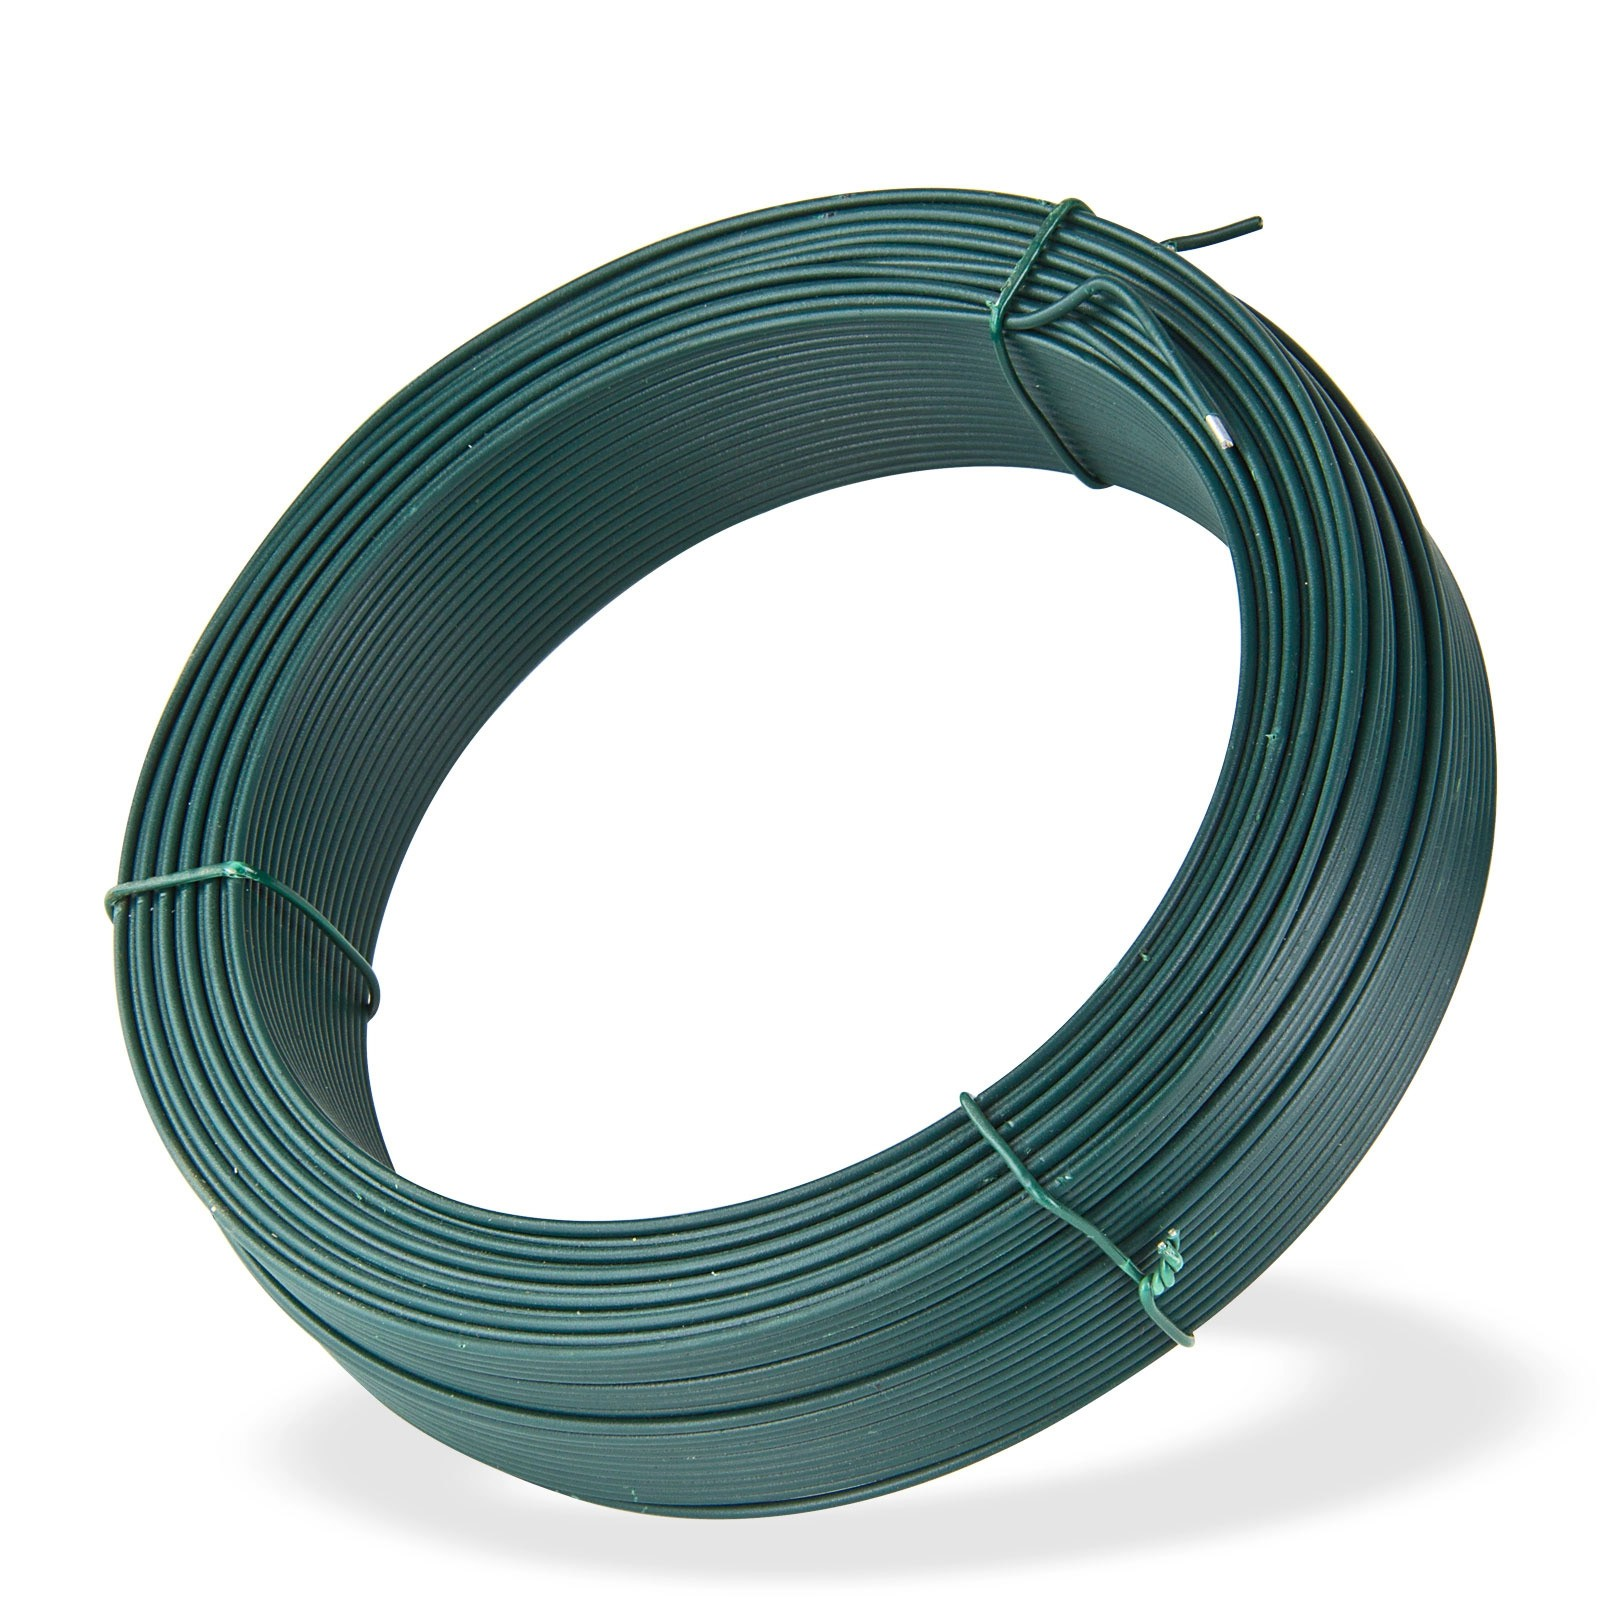 Dema Bindedraht grün 100 m x 2,0 mm Wickeldraht Volierendraht Maschendraht Zaun Draht 31305